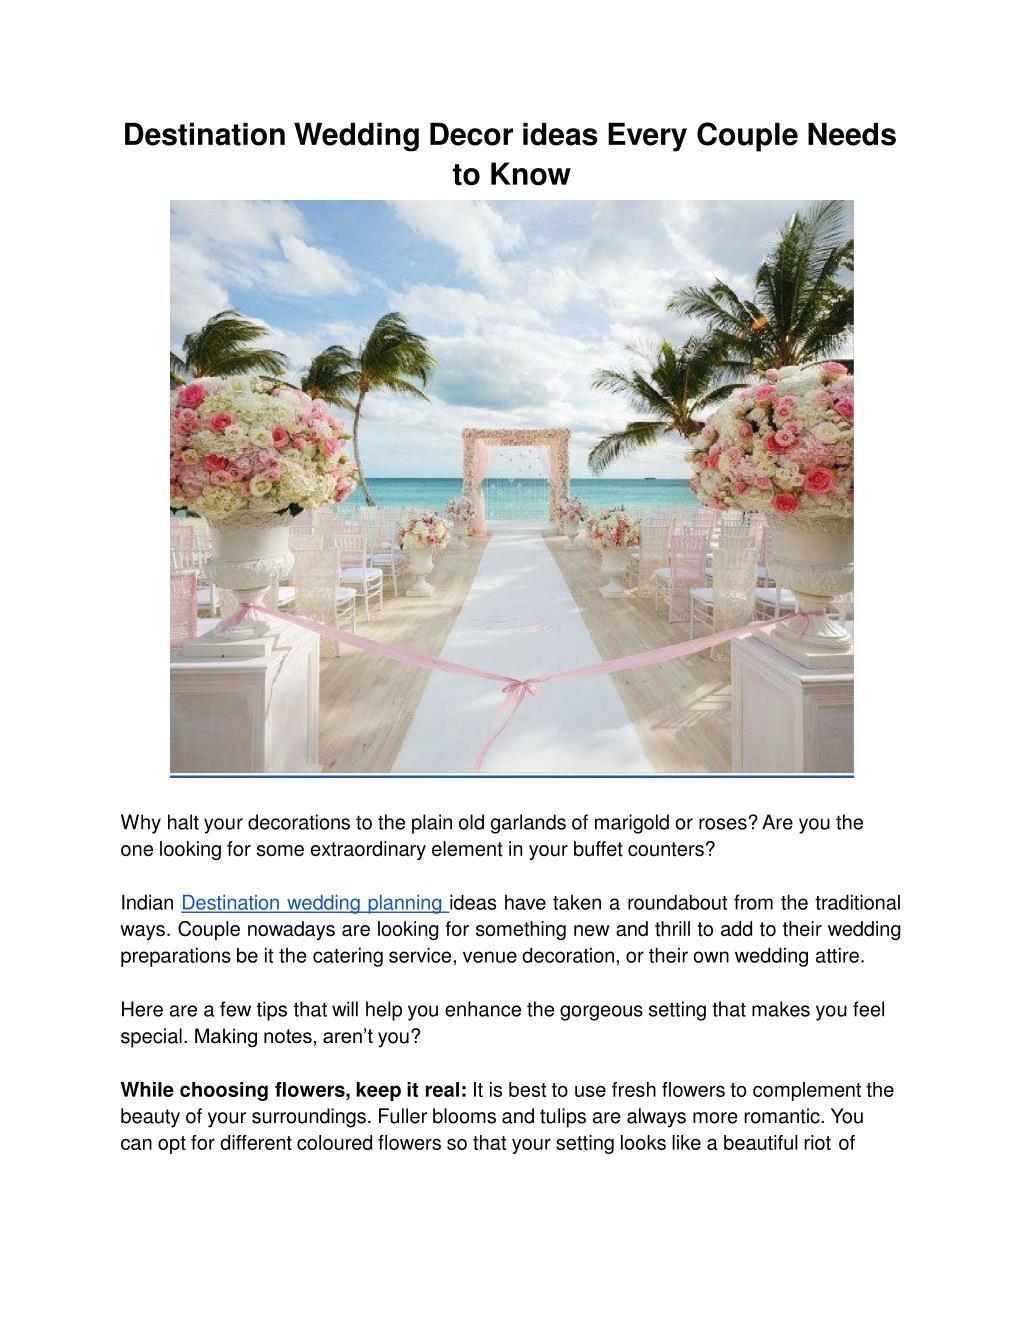 Ppt Destination Wedding Decor Ideas By Behind The Scene Powerpoint